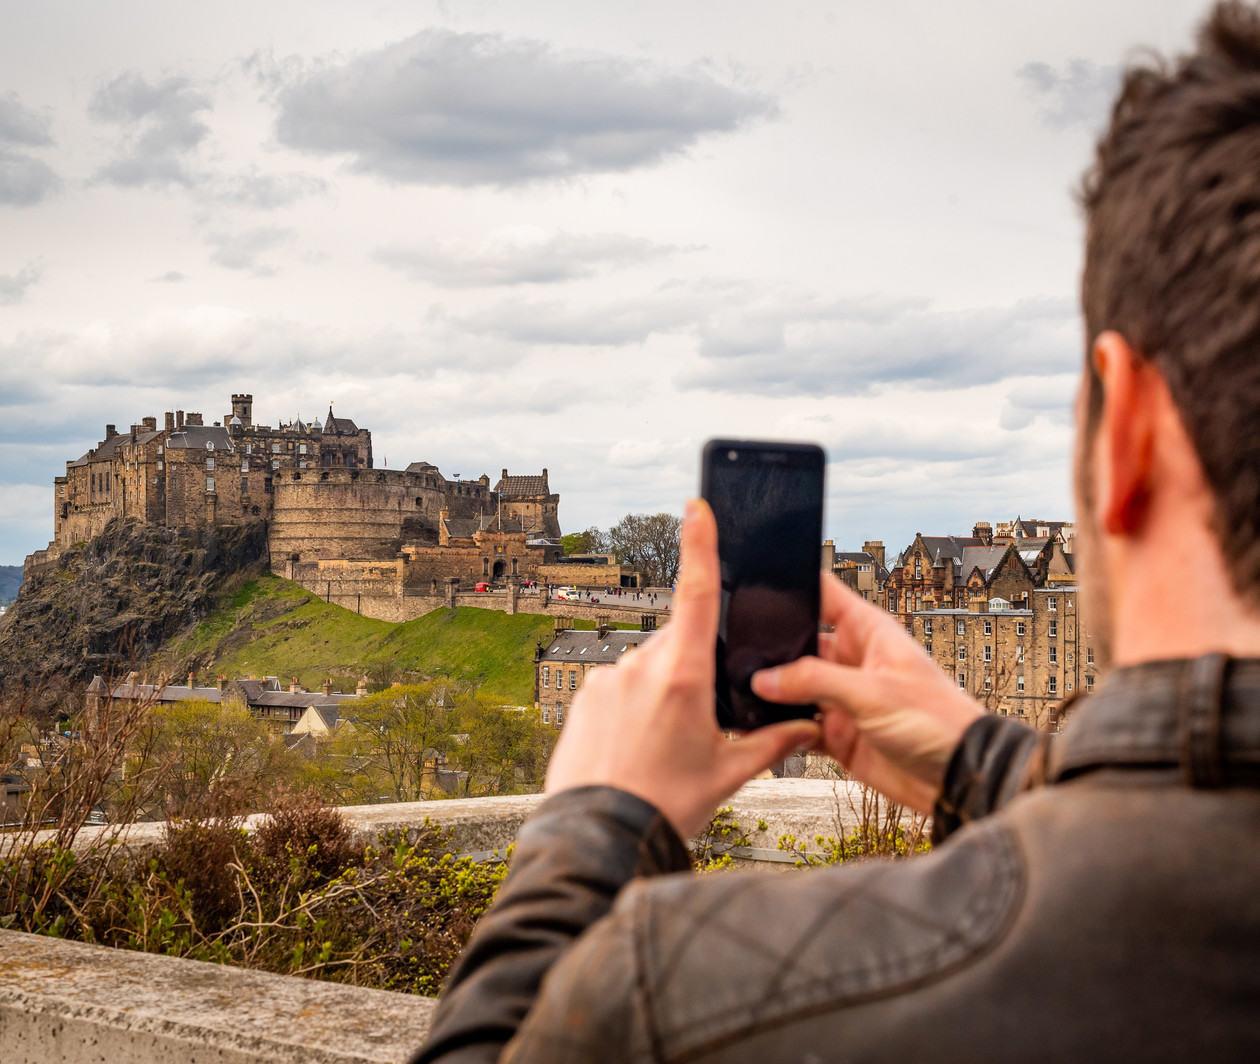 Understanding Data in the Tourism Industry